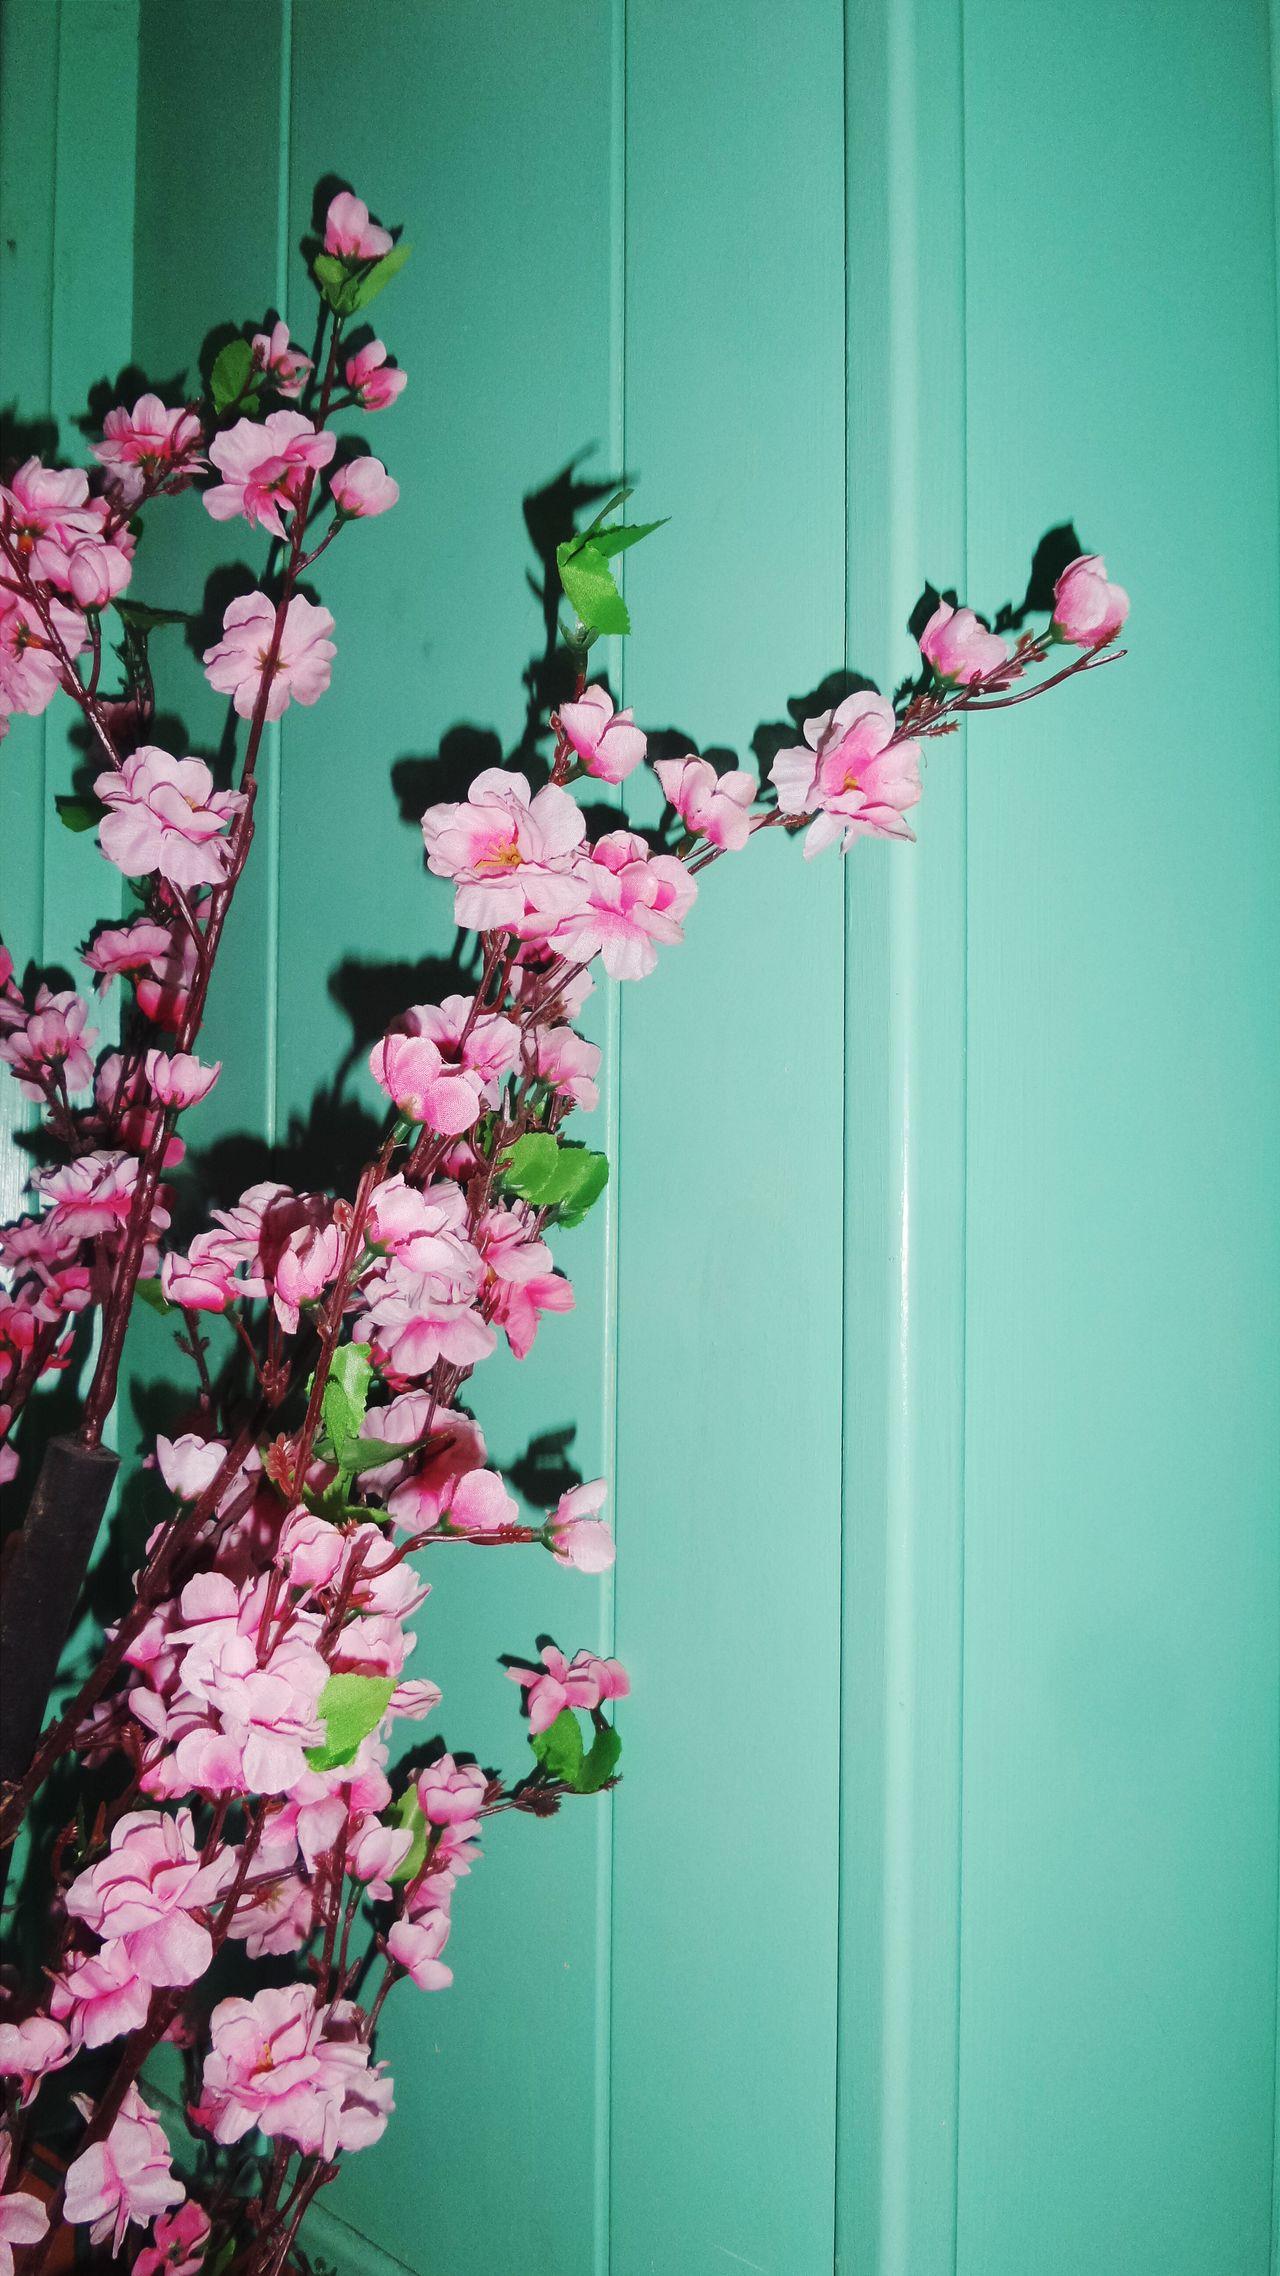 Plasticflowers Green Wall Interrior